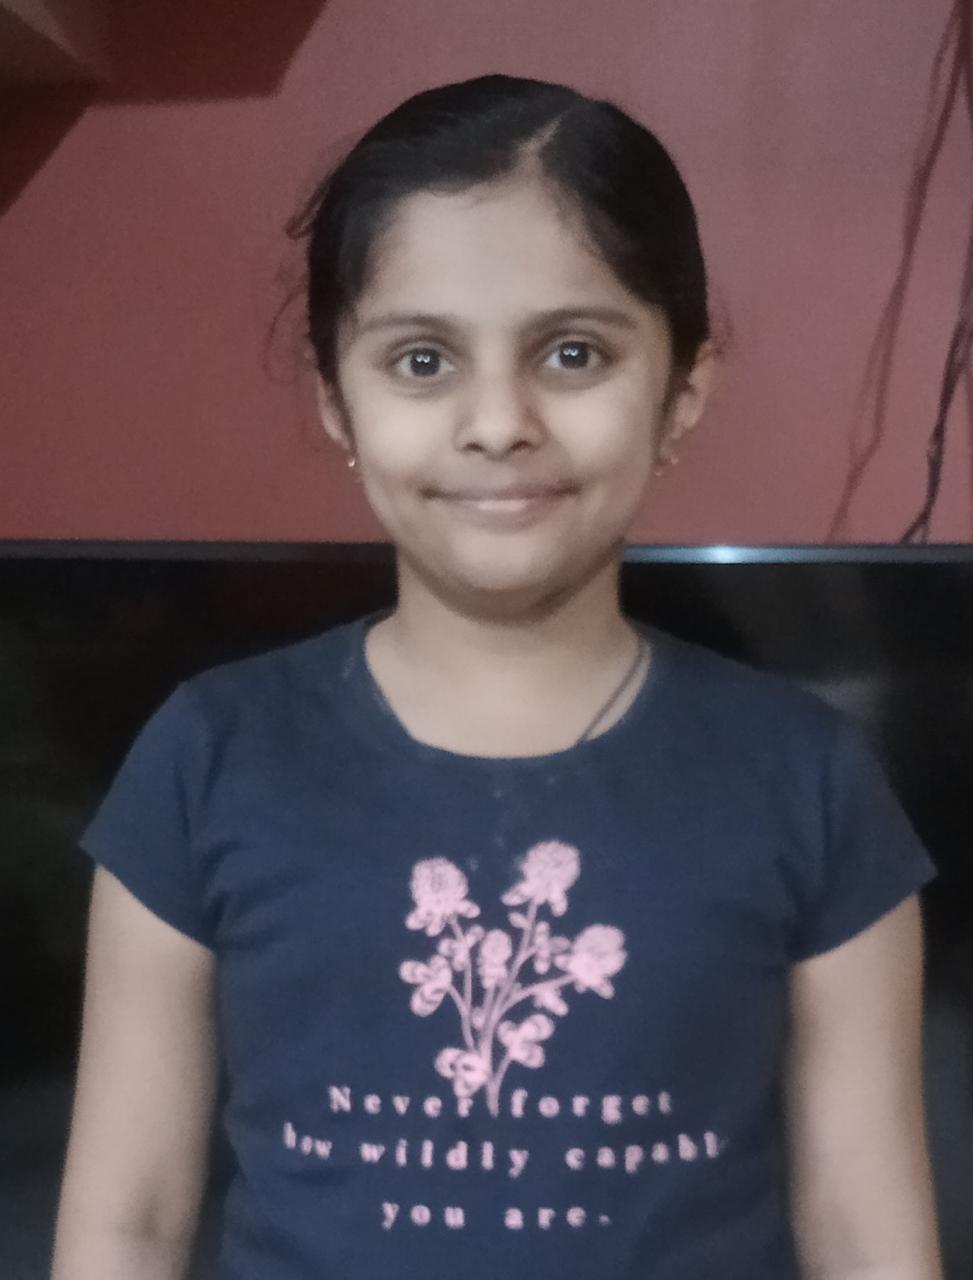 Mrunmayee won the 5th CG U500 for Indian students